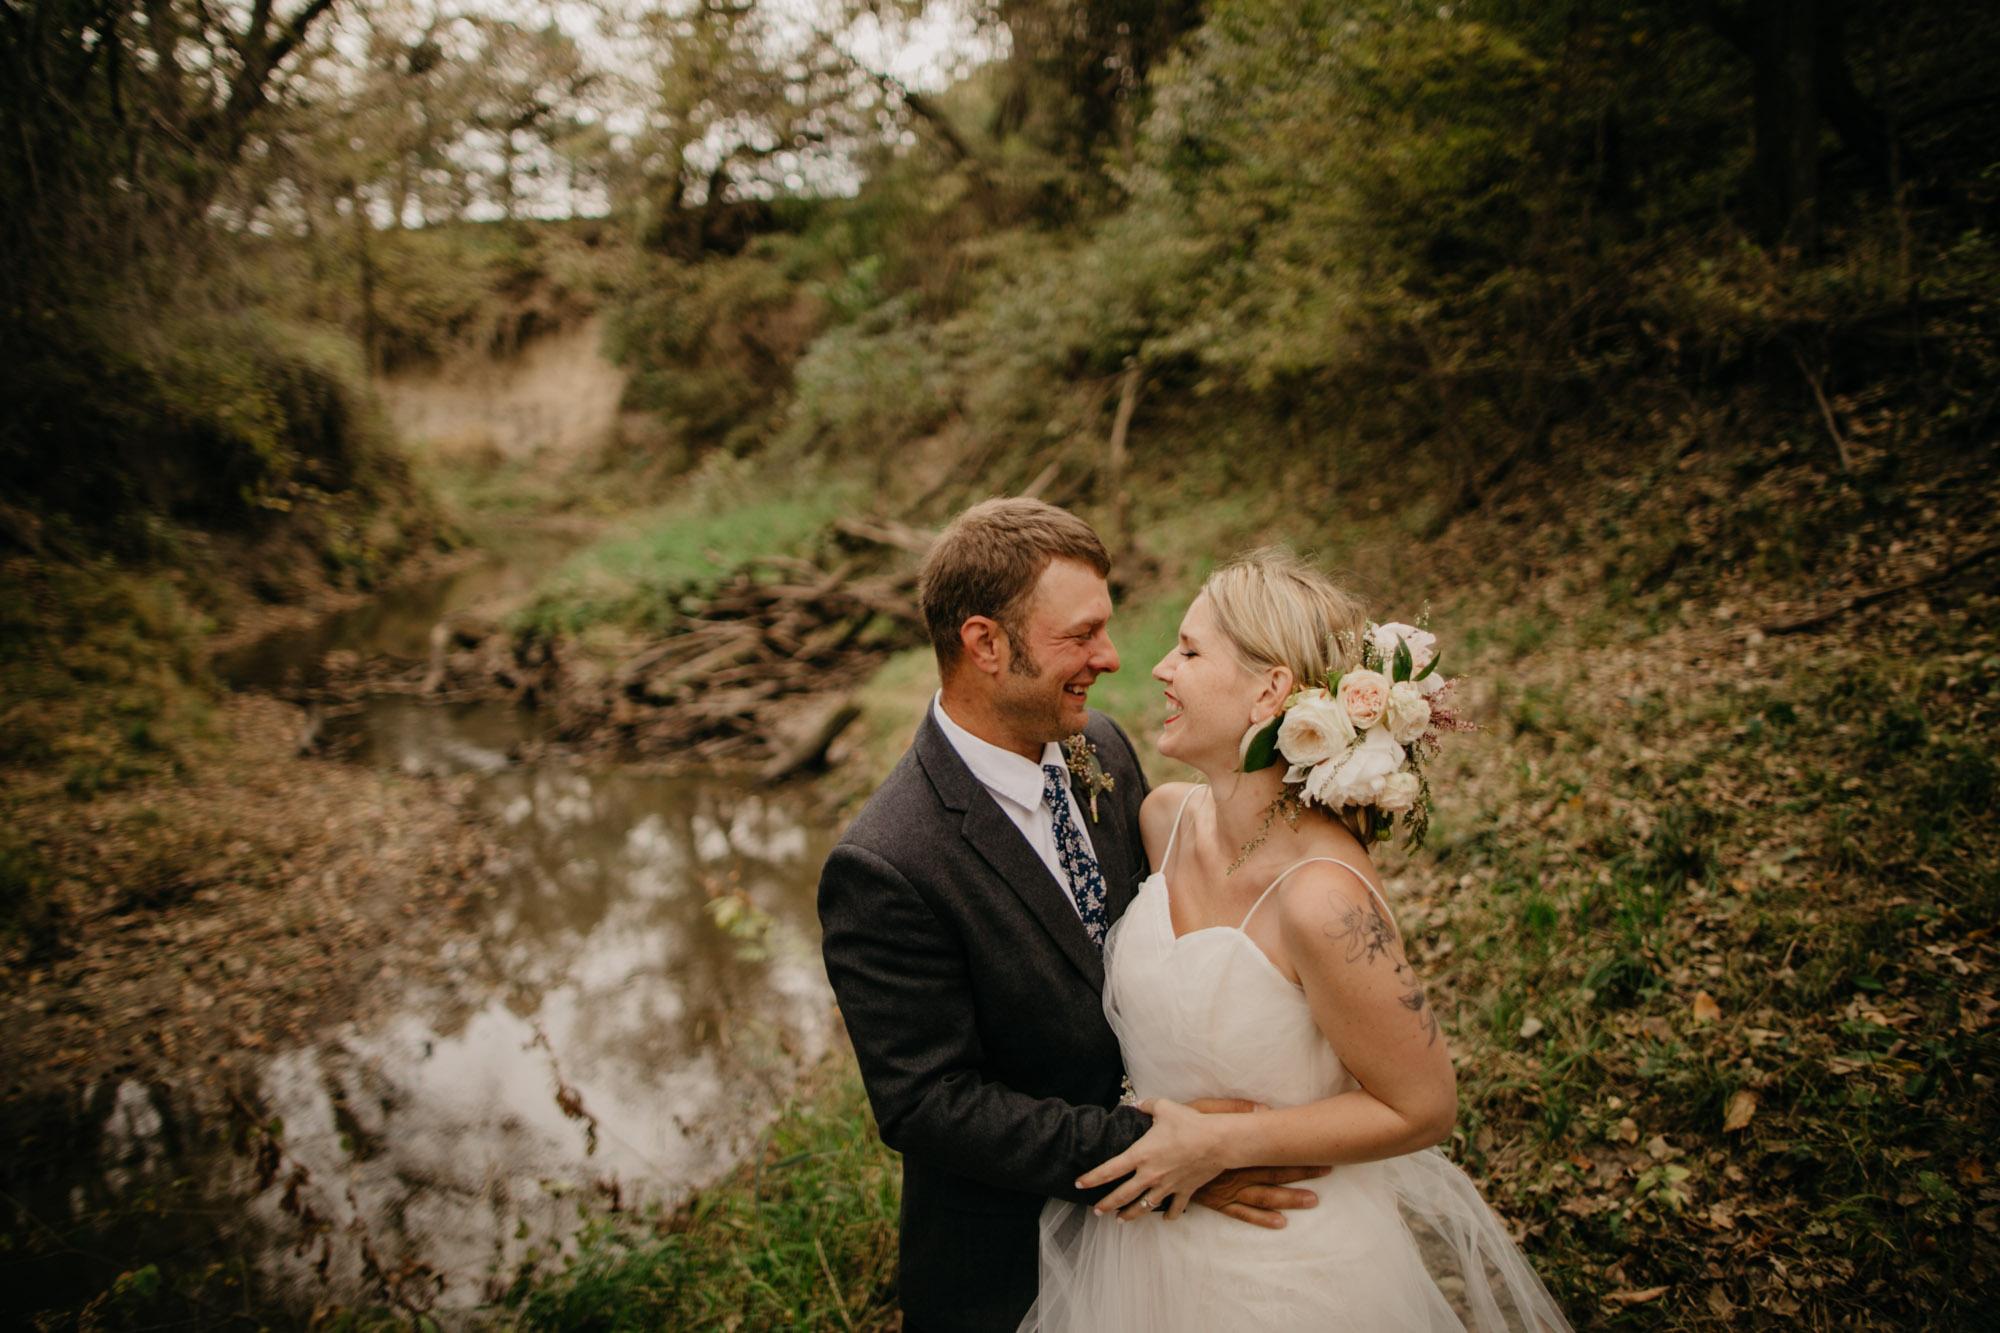 omaha-wedding-photographer-meghan-time-37.jpg